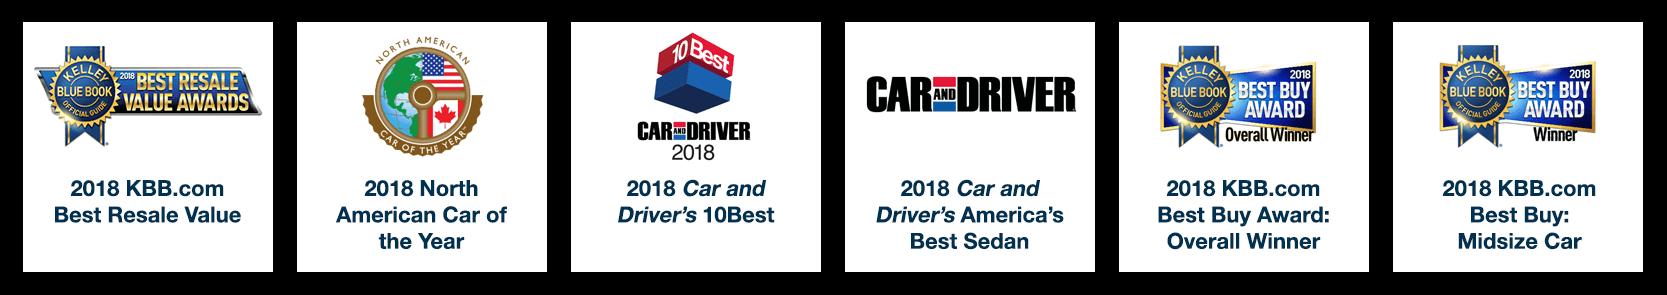 2018 Honda Accord Awards